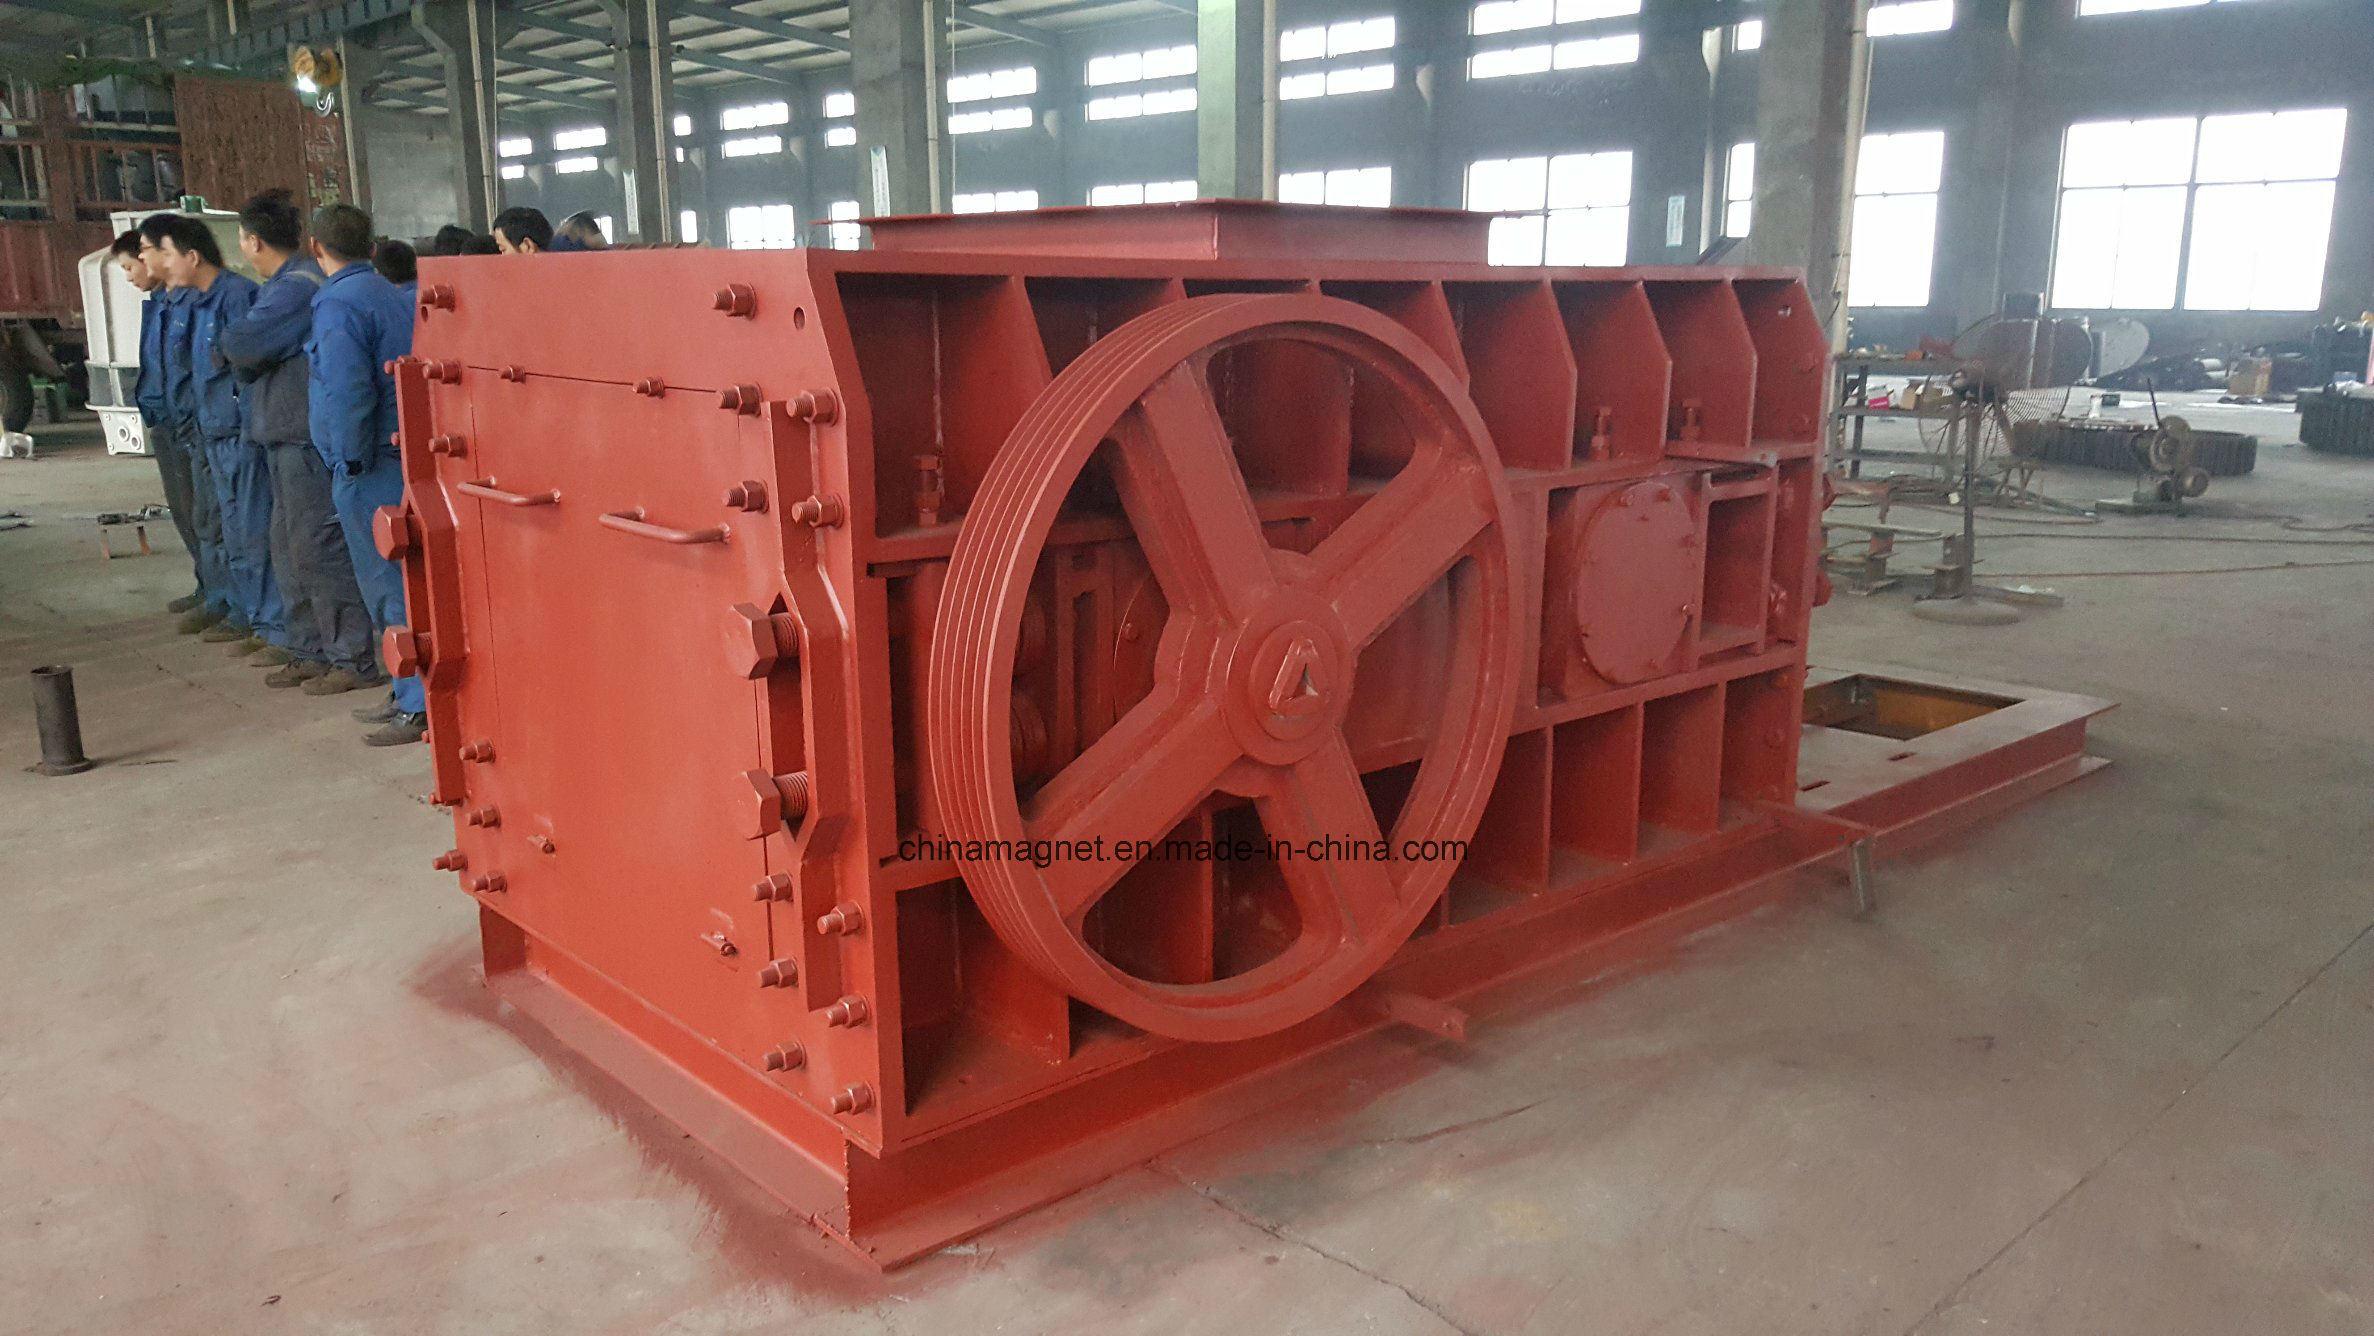 2pg Mining Crusher/Roller Crusher/Double Roll Crushing Machine for Granite/Limestone/ Coal/Coke/Refactory Material Crushing